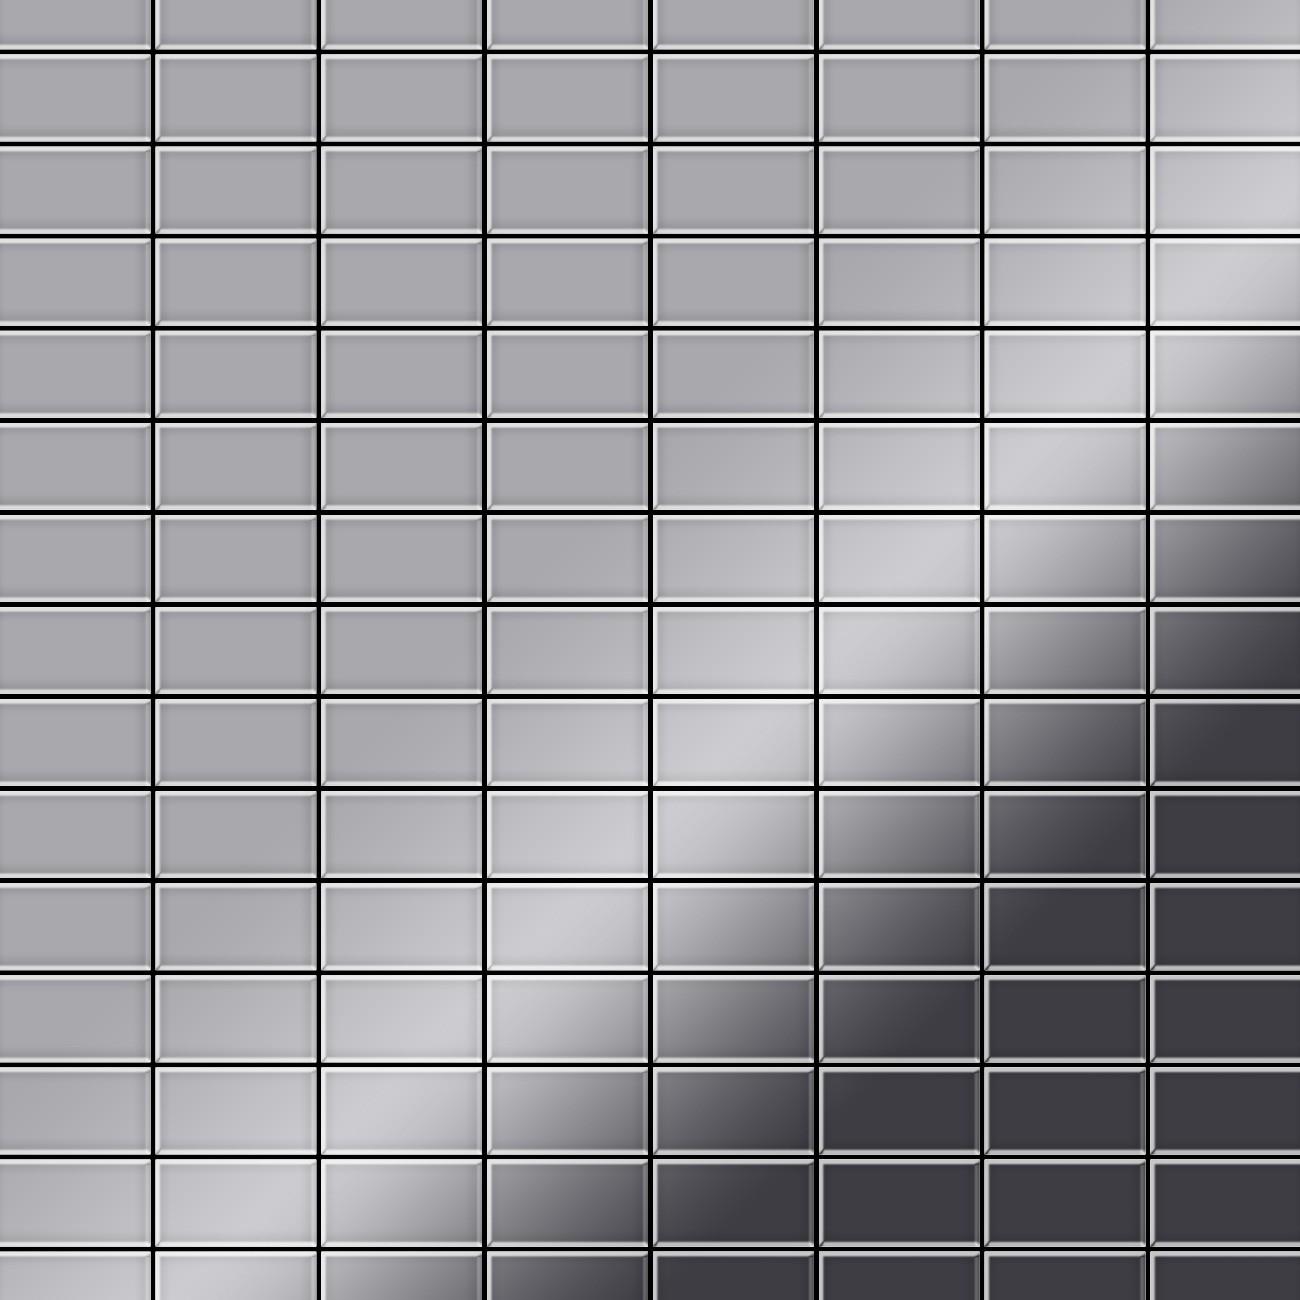 mosaik fliese massiv metall edelstahl hochglanz grau 1 6mm. Black Bedroom Furniture Sets. Home Design Ideas